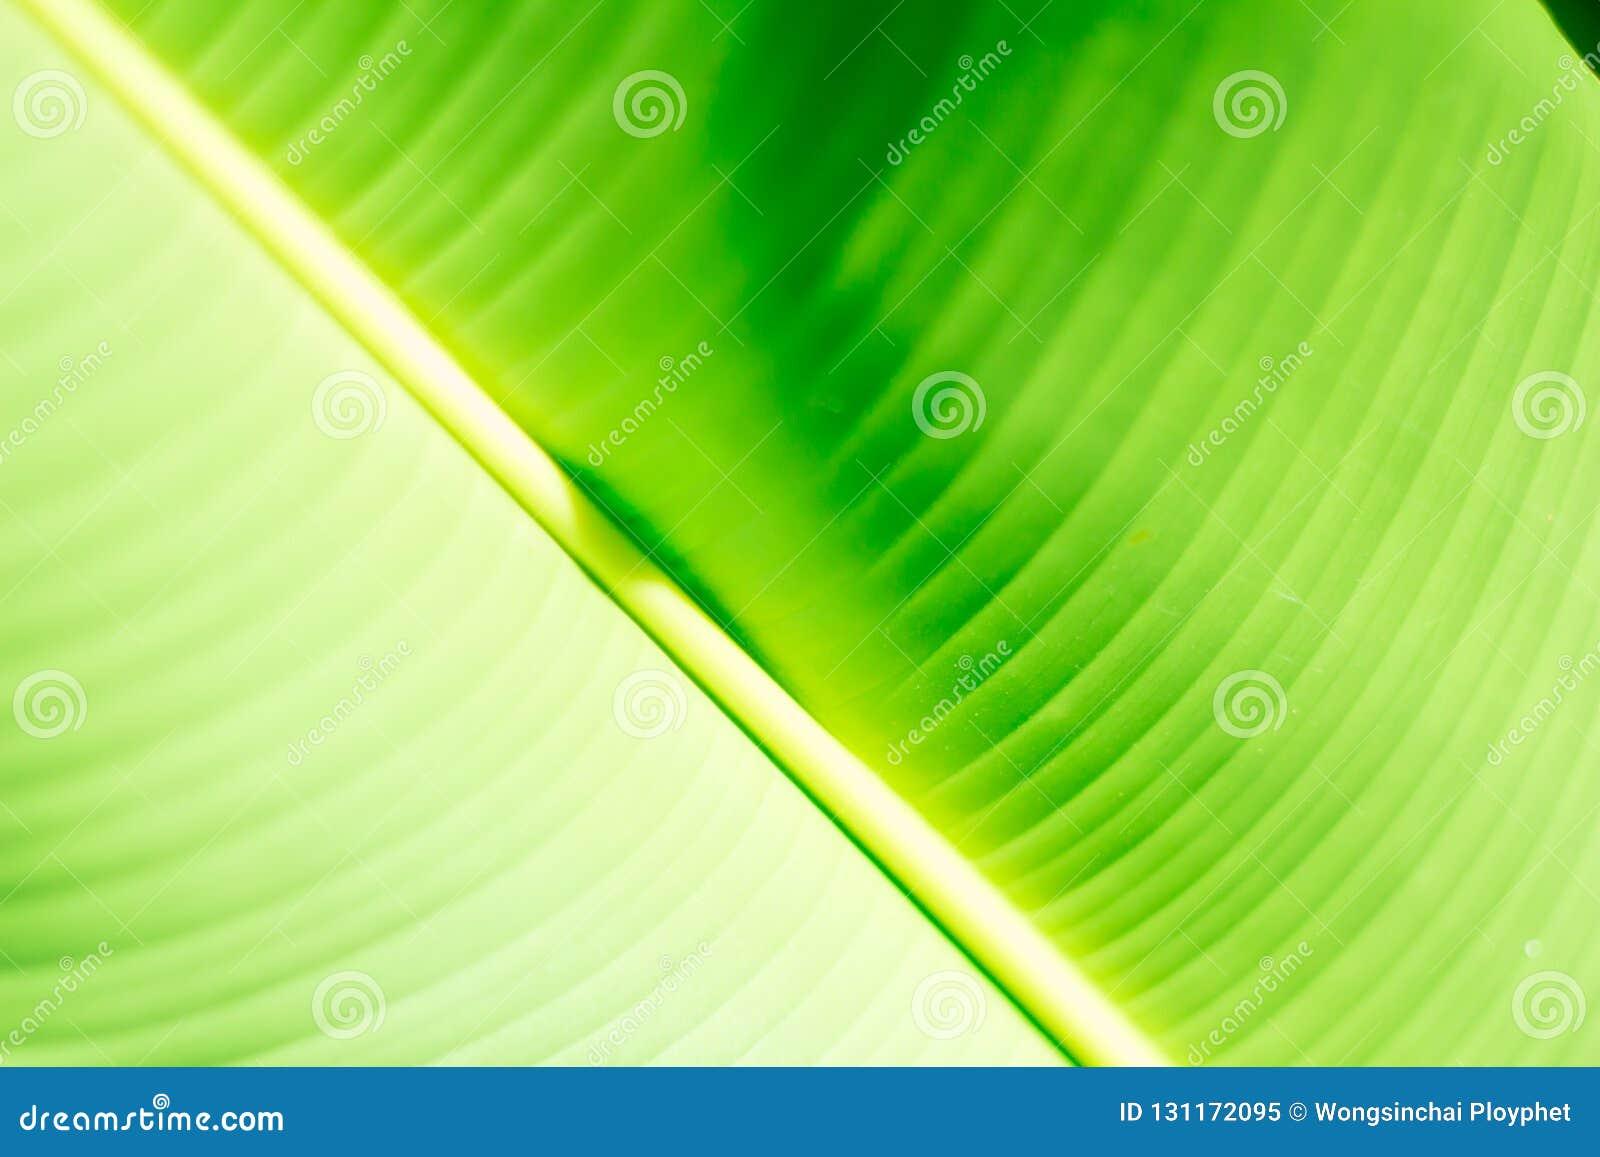 Fresh green tropical banana leaf isolated on white background, path